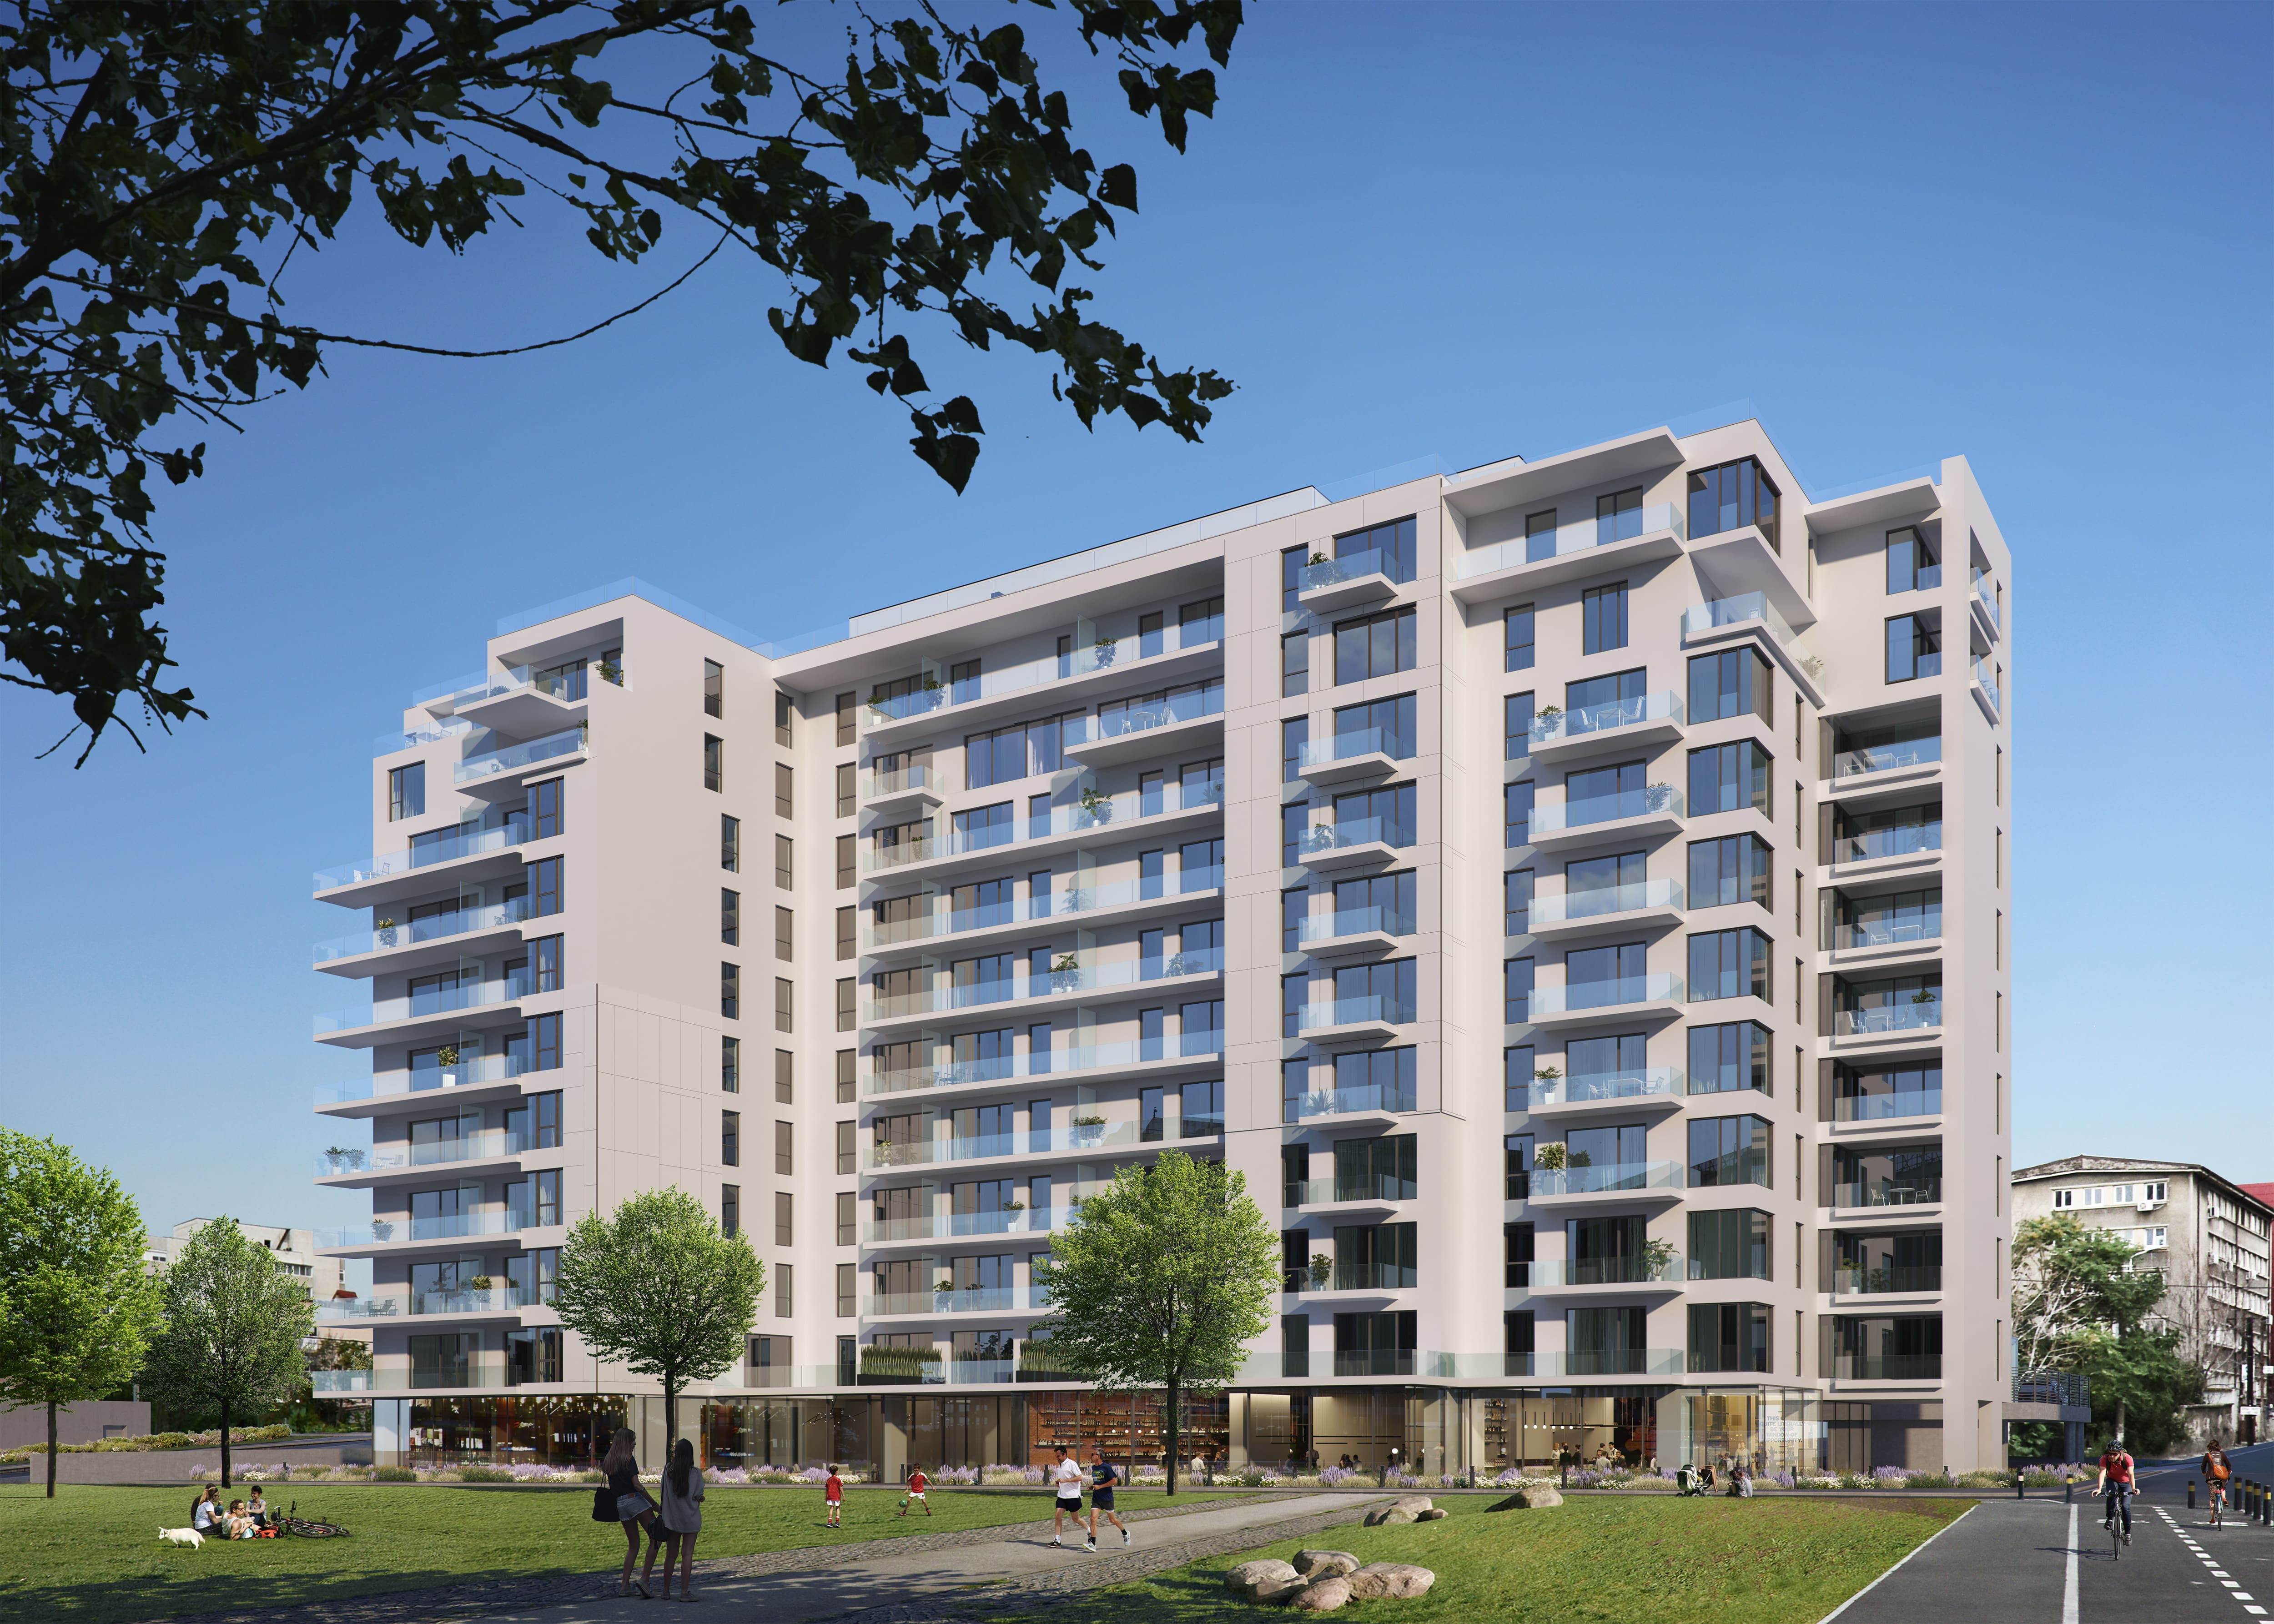 https://ahe-ro.s3.amazonaws.com/8111/penthouse-si-apartamente-unirii-%287%29.jpg